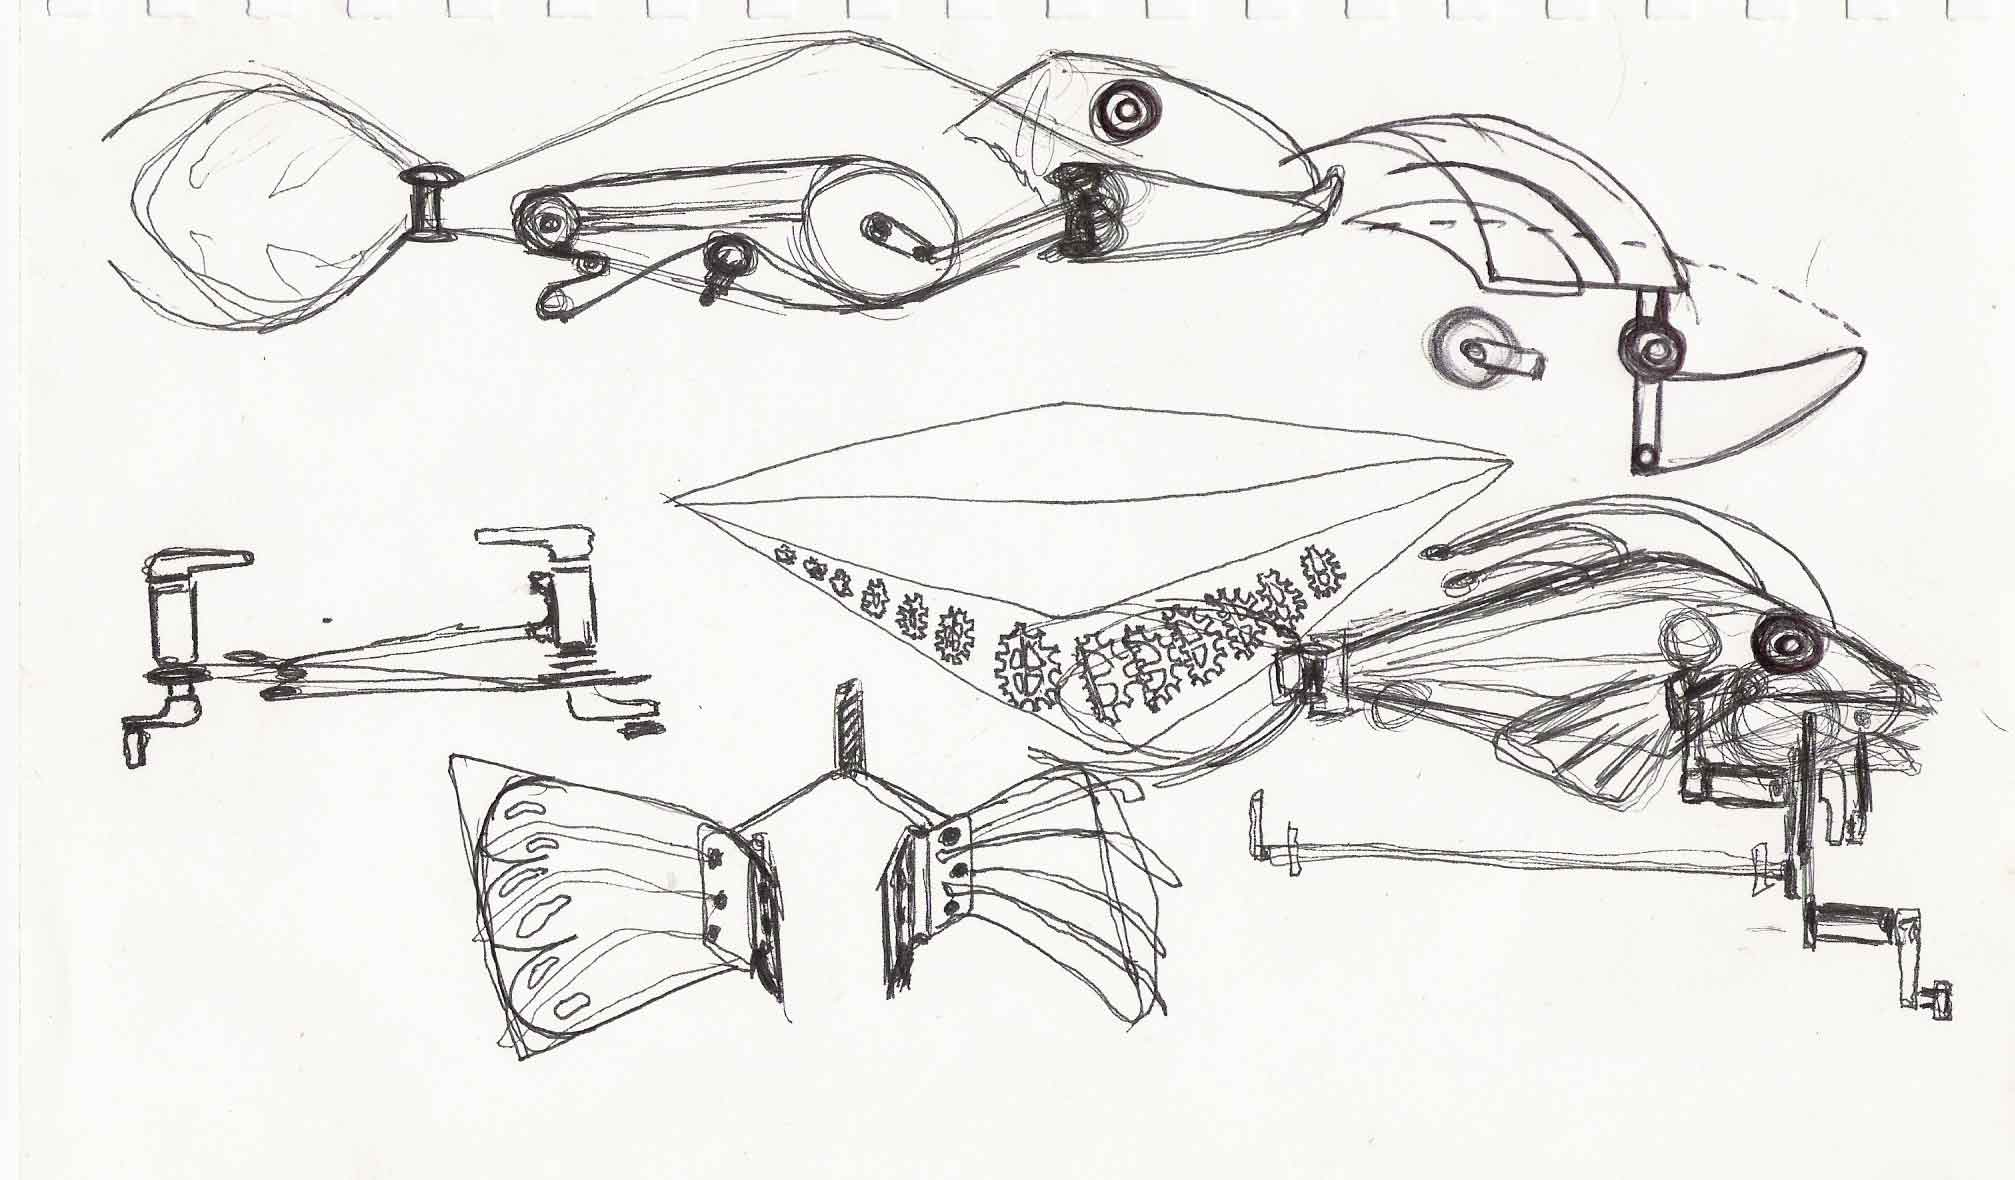 2 nd Fish Sketch